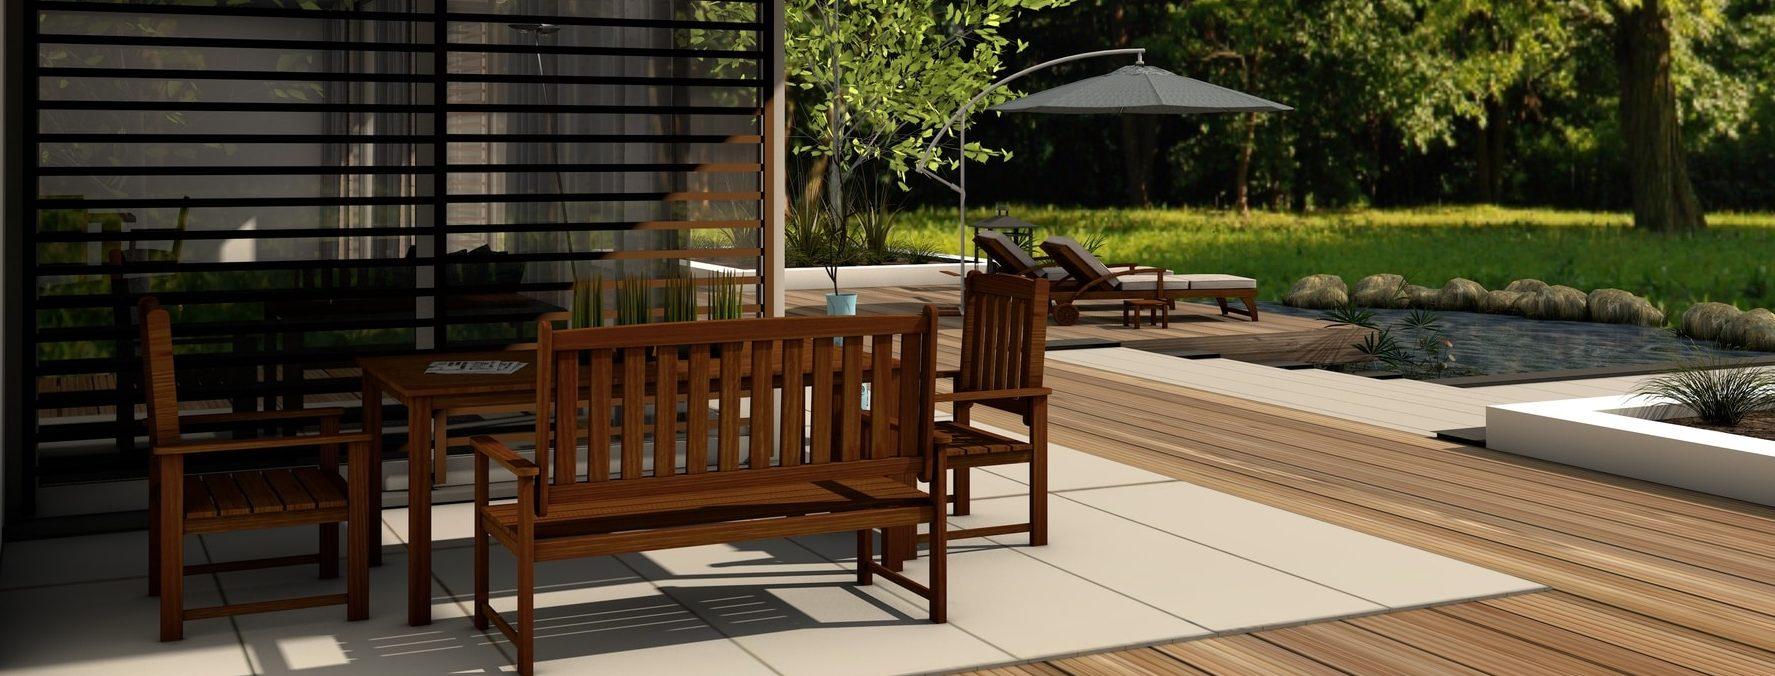 Aménagement extérieur : Nos idées pour aménager son jardin